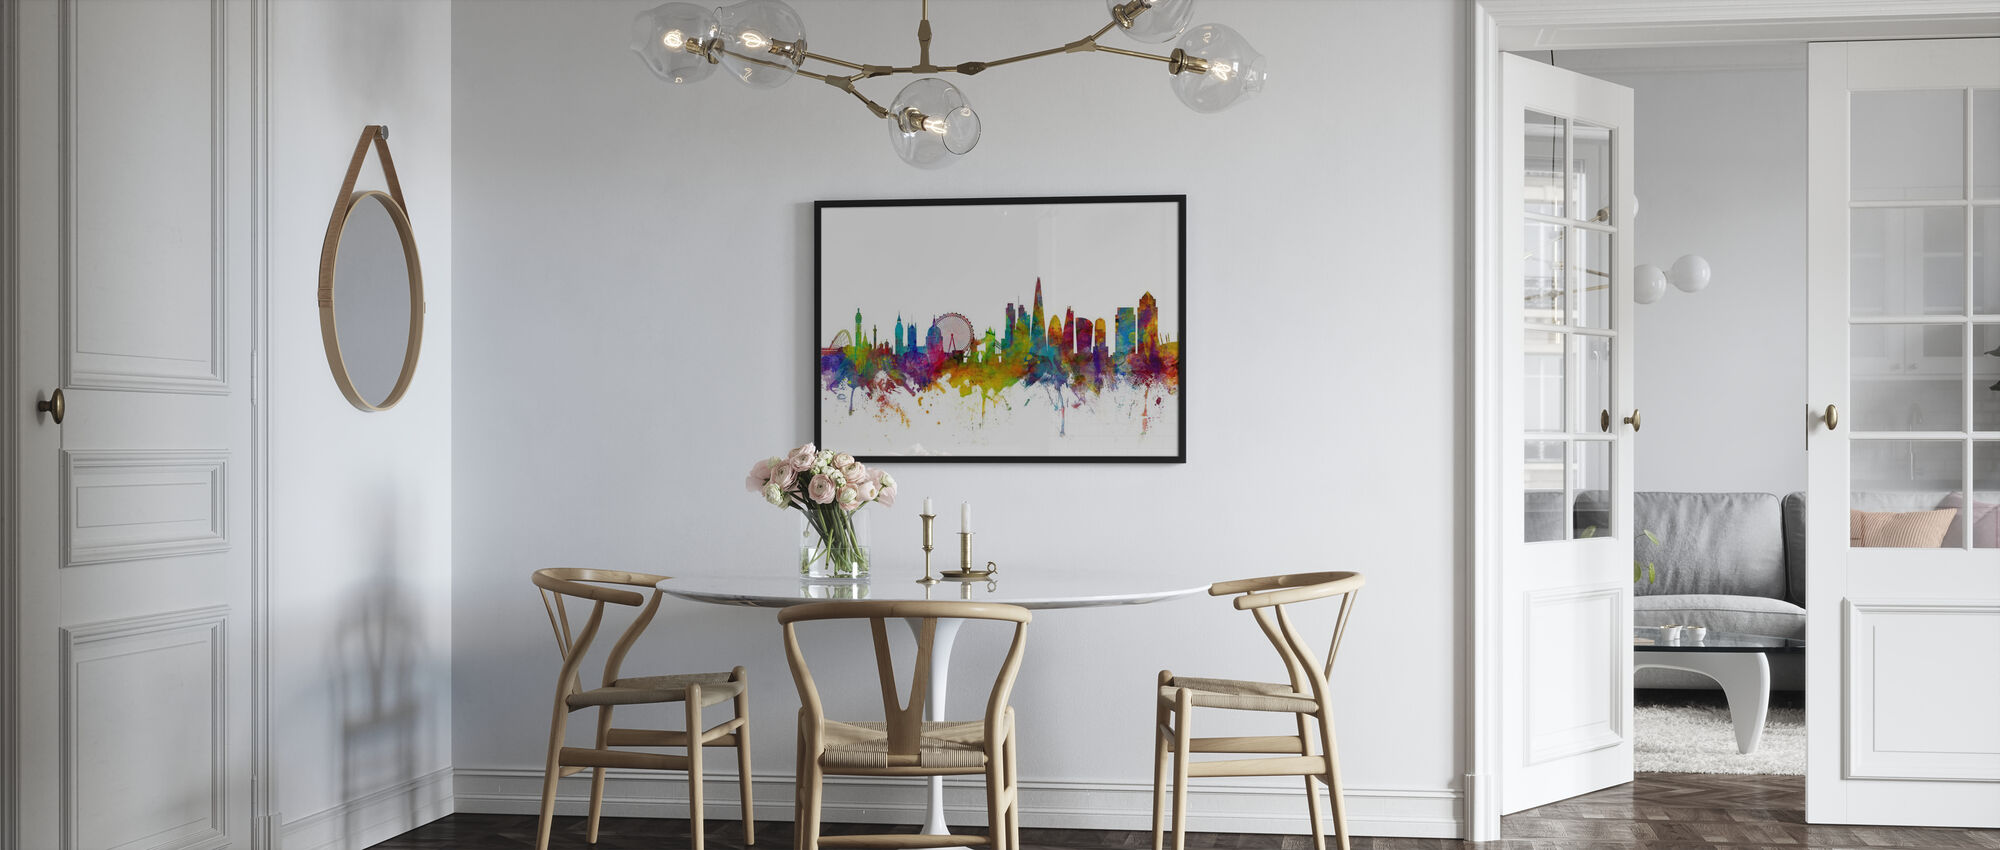 London Canary Wharf skyline - Framed print - Kitchen